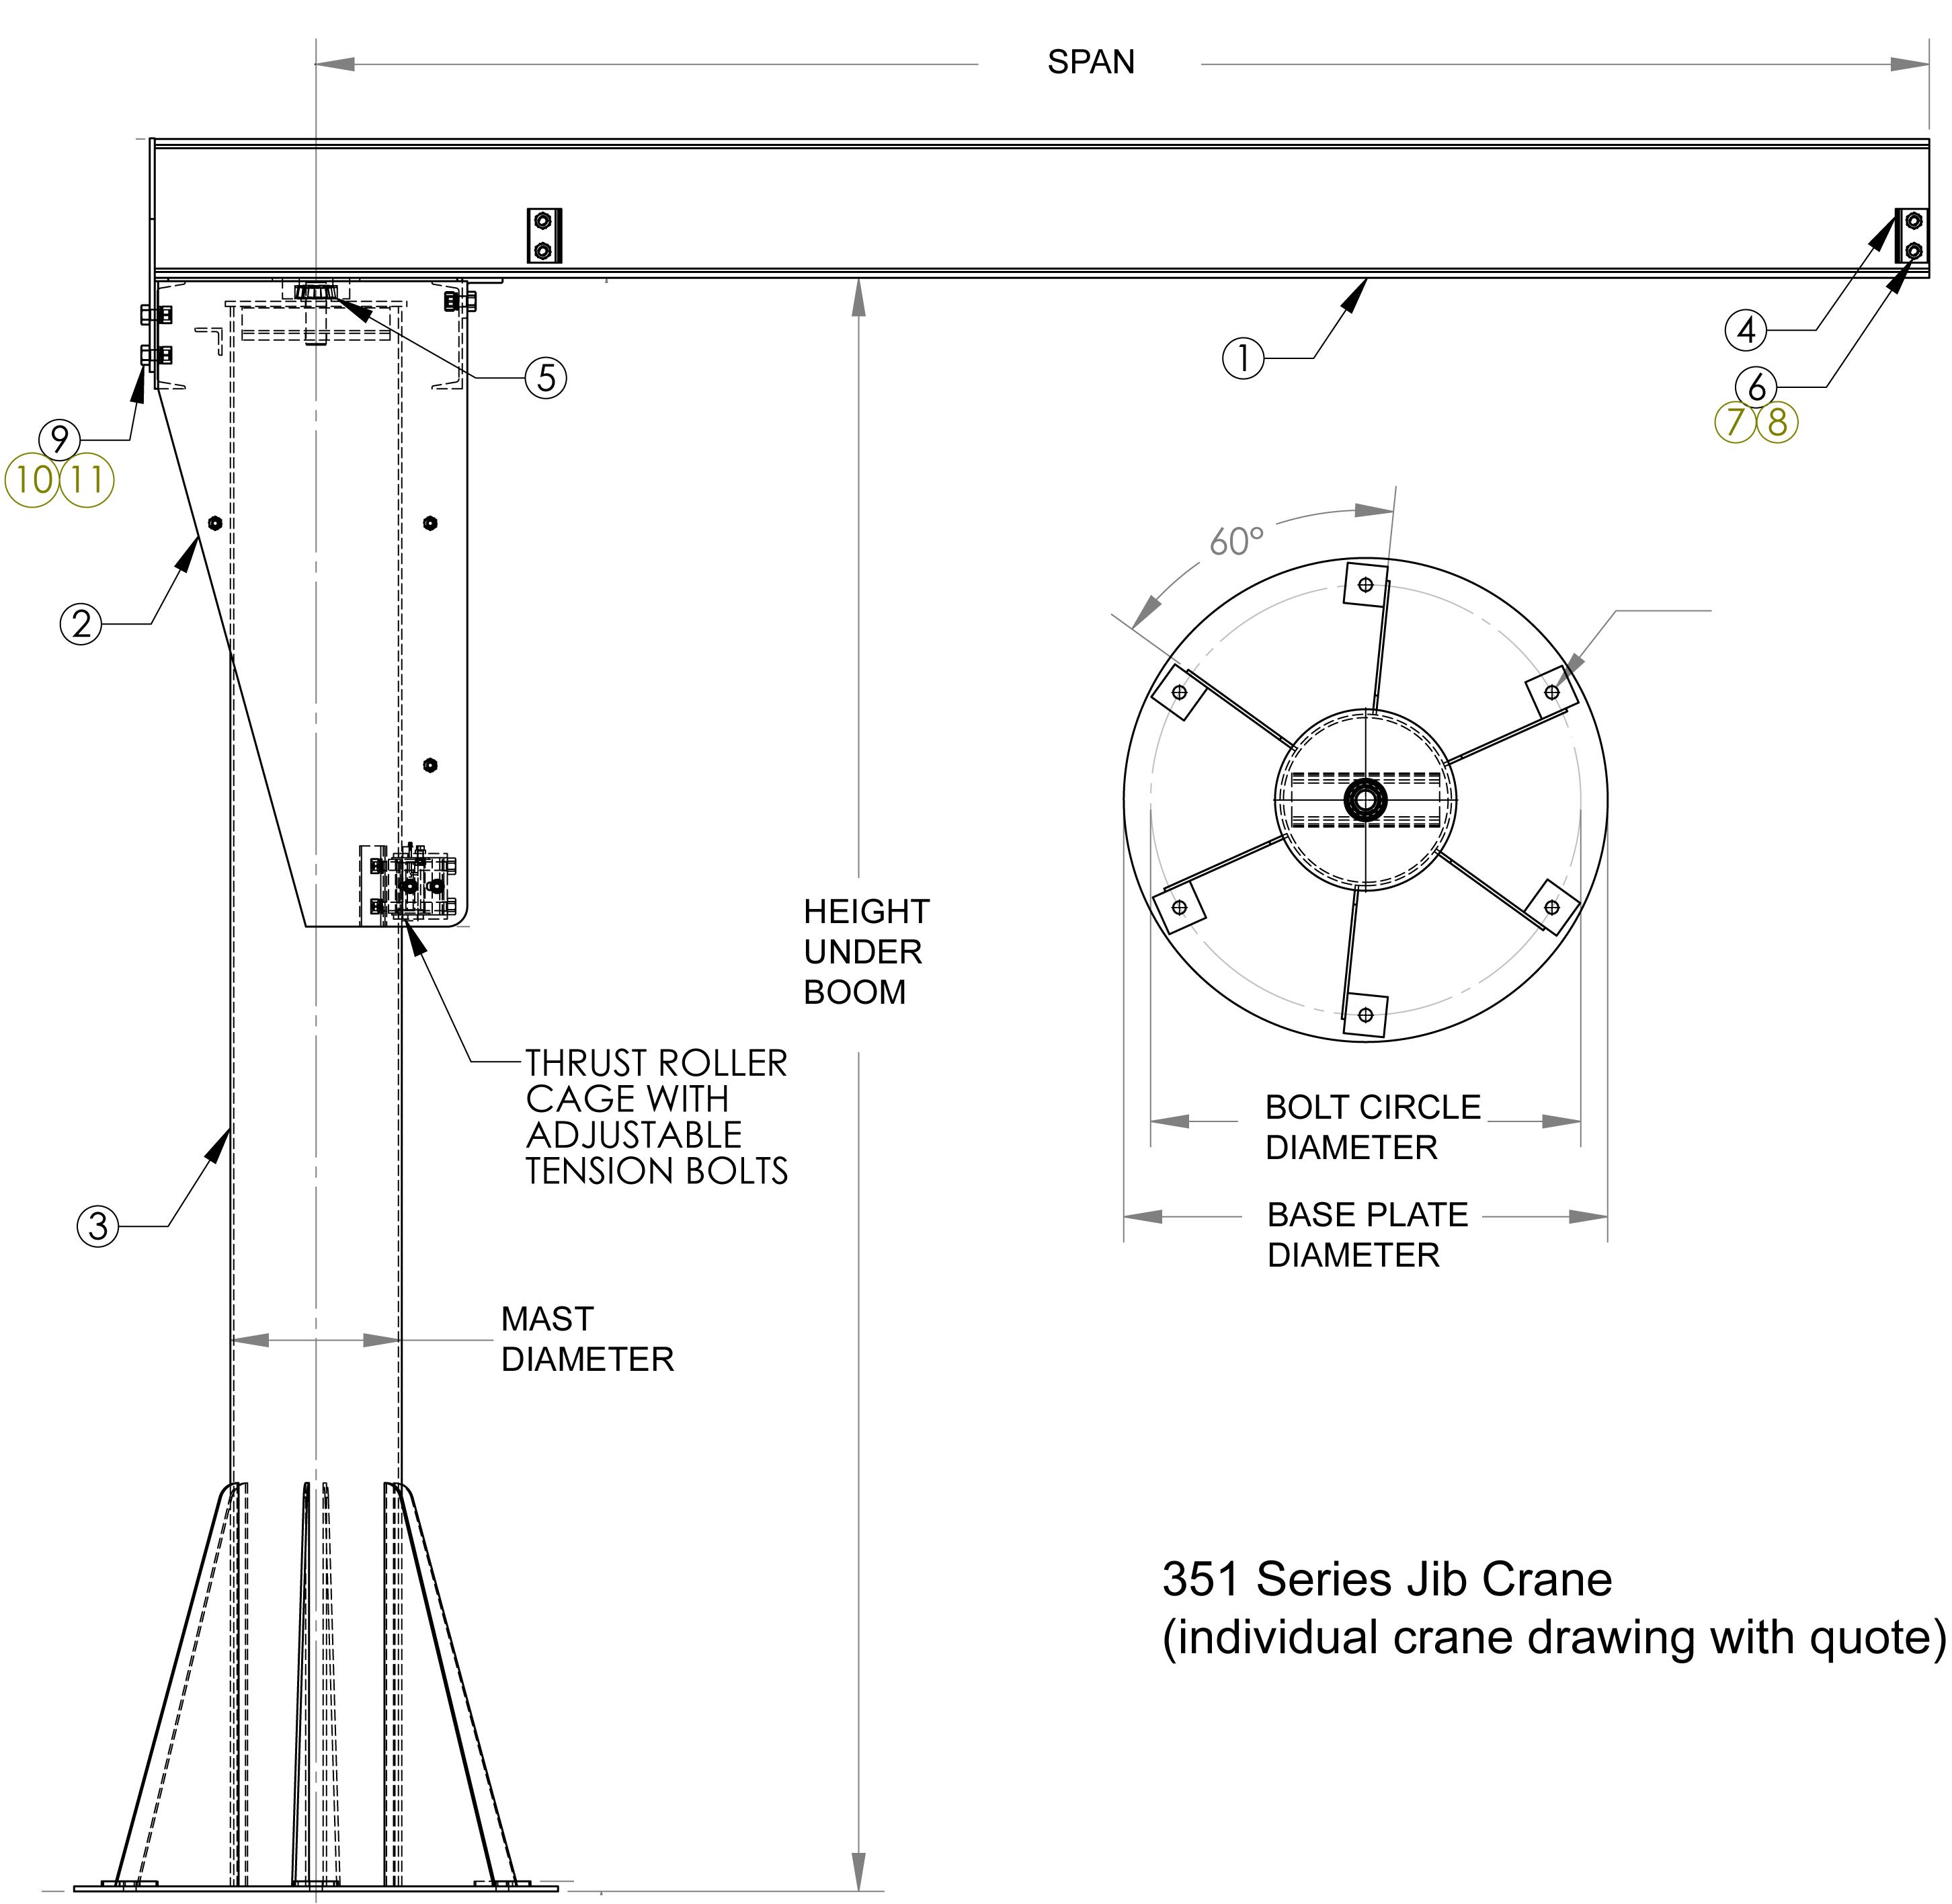 Jib Crane Parts Drawing : Jib crane design drawings images free standing